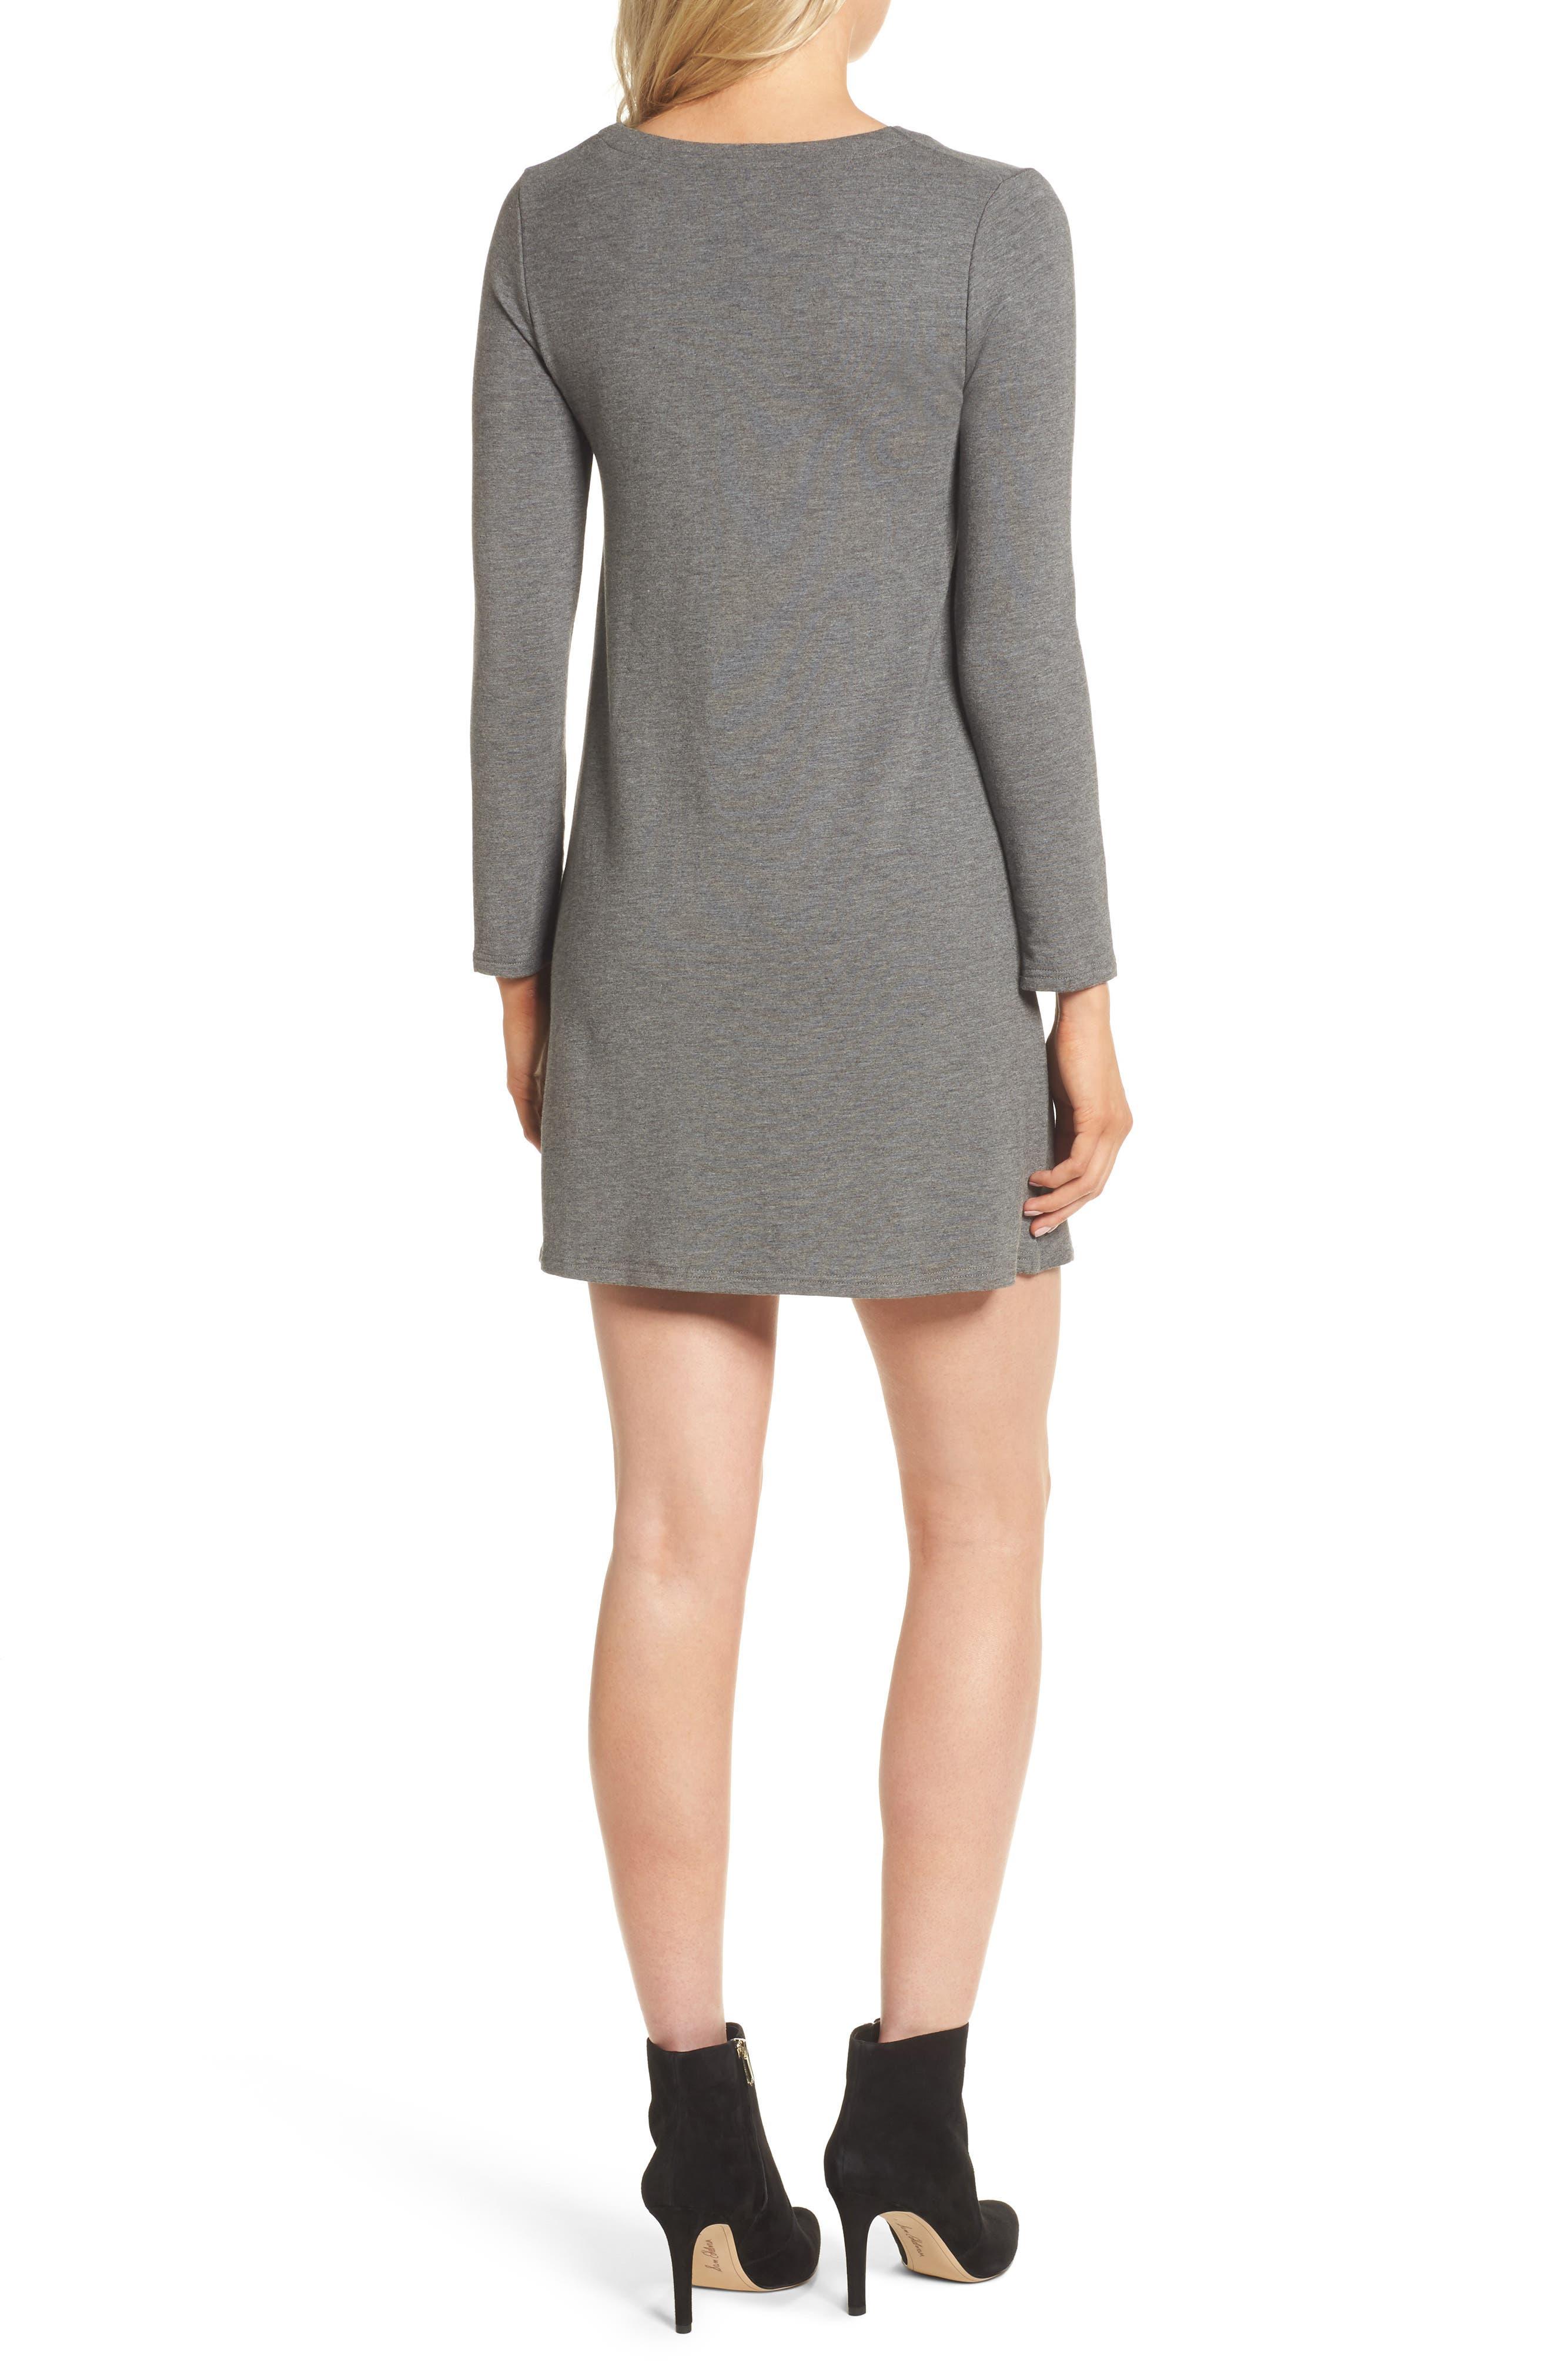 Celerina Lace-Up Minidress,                             Alternate thumbnail 2, color,                             Med Heather Grey